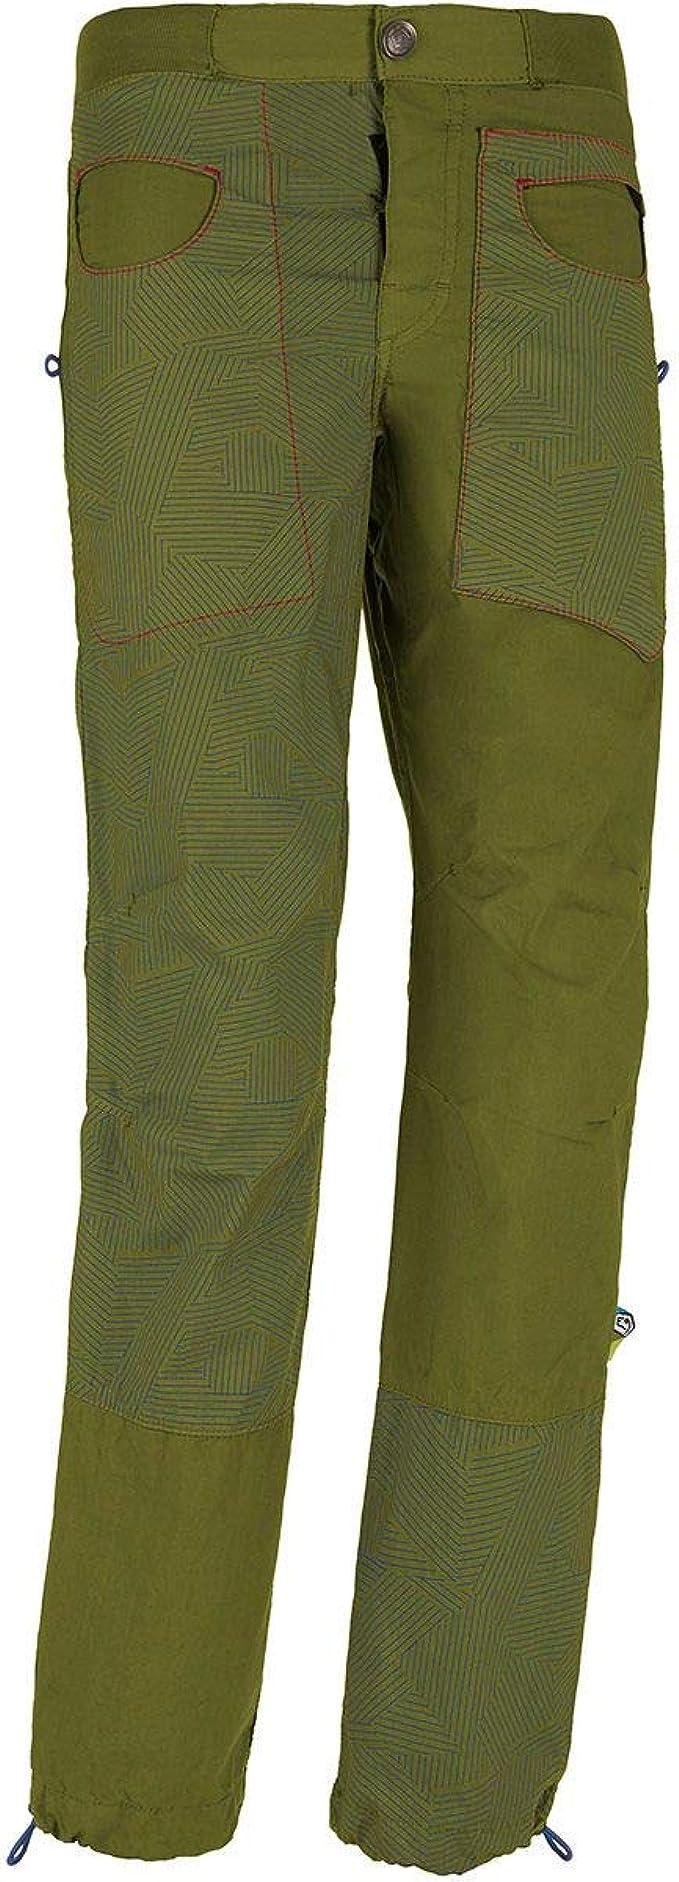 E9 Pantalones N B Blat2 para niño, pistacho, 6 años: Amazon ...